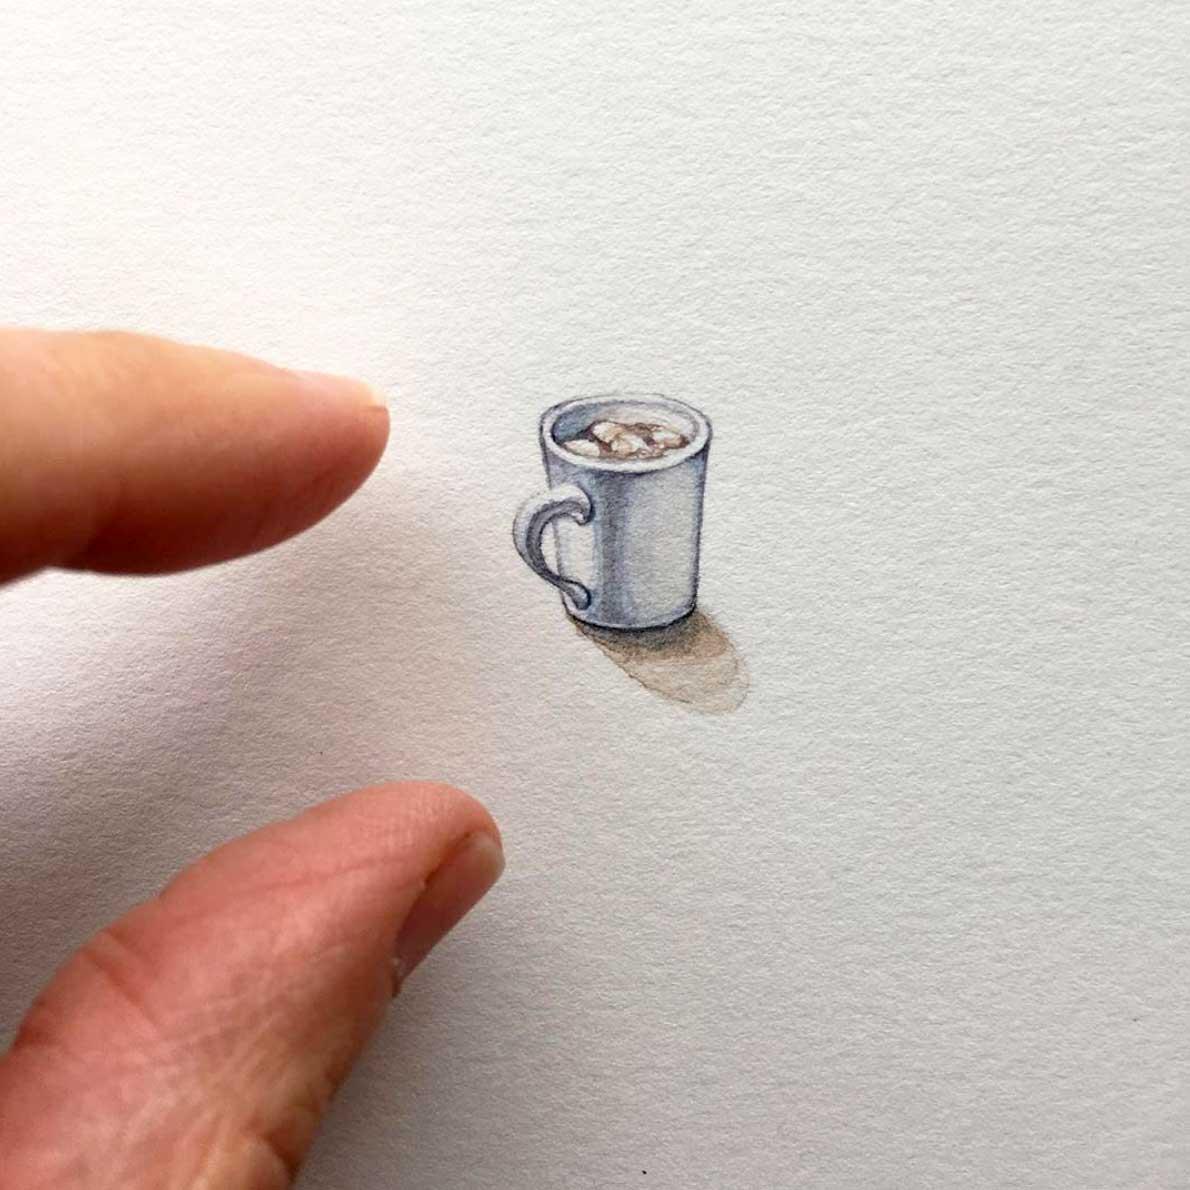 Miniatur-Gemälde von Brooke Rothshank Brooke-Rothshank-miniatur-malerei_03